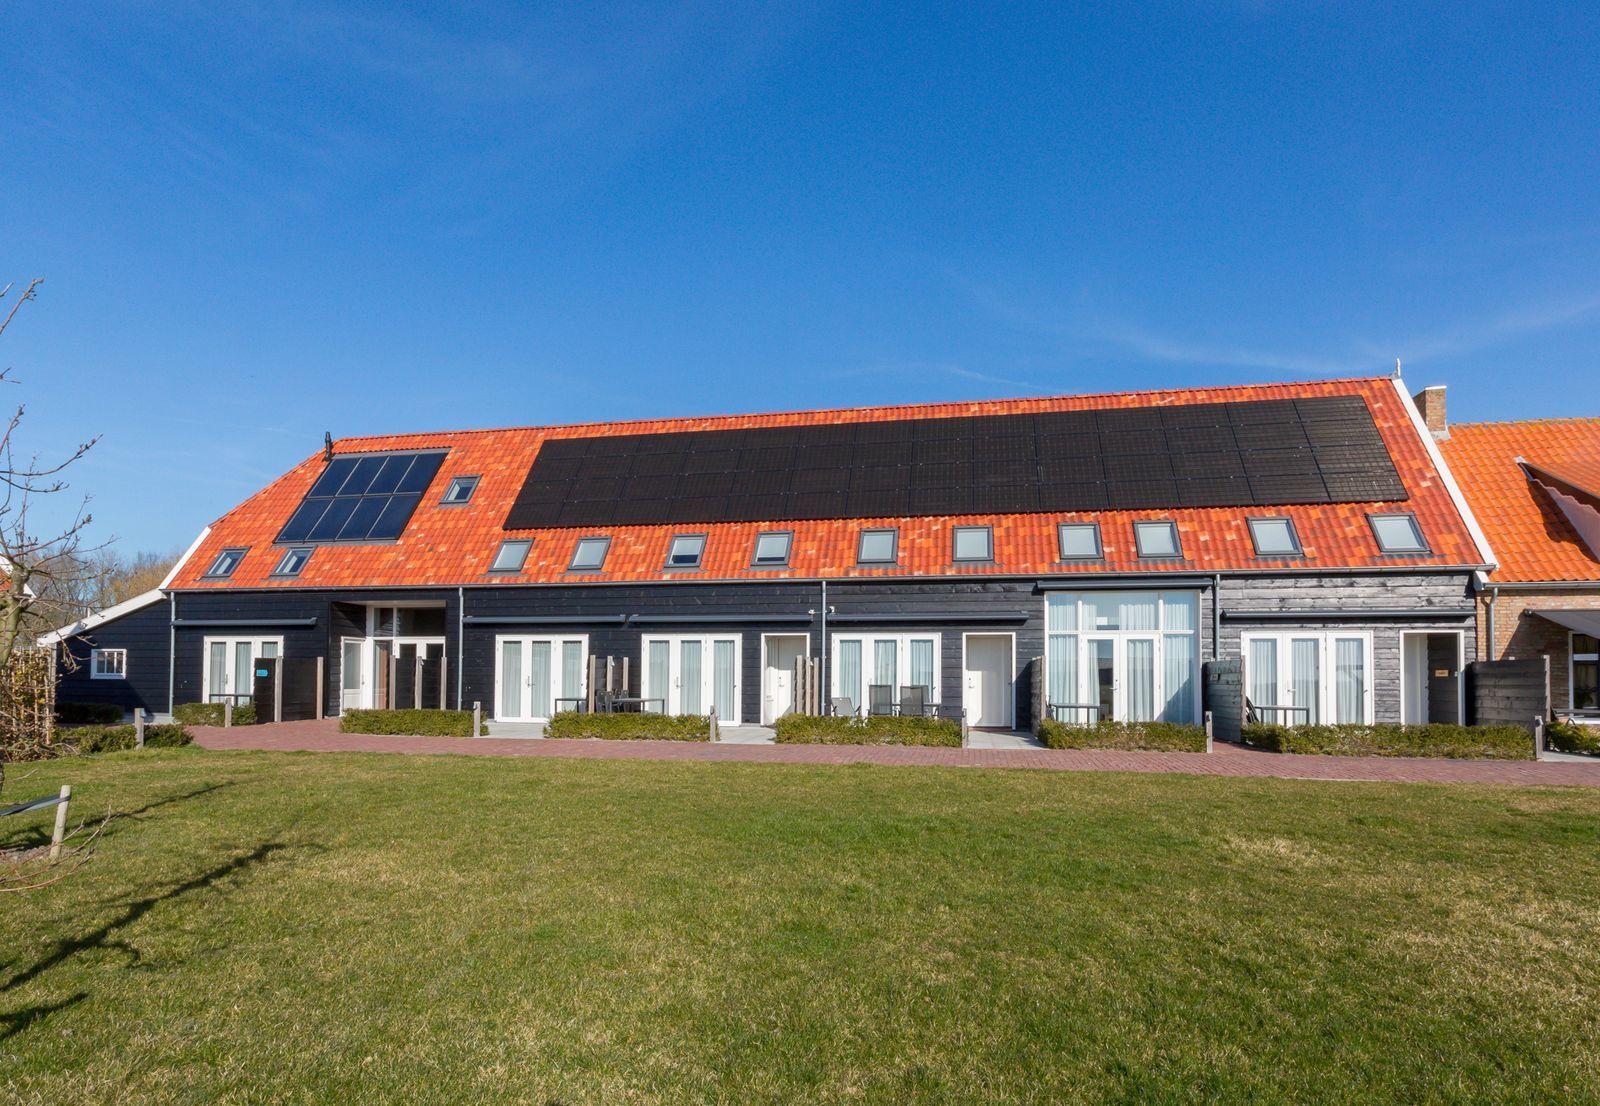 "Ferienwohnung - Noordweg 56a | Oostkapelle ""Comfort 6 personen"""